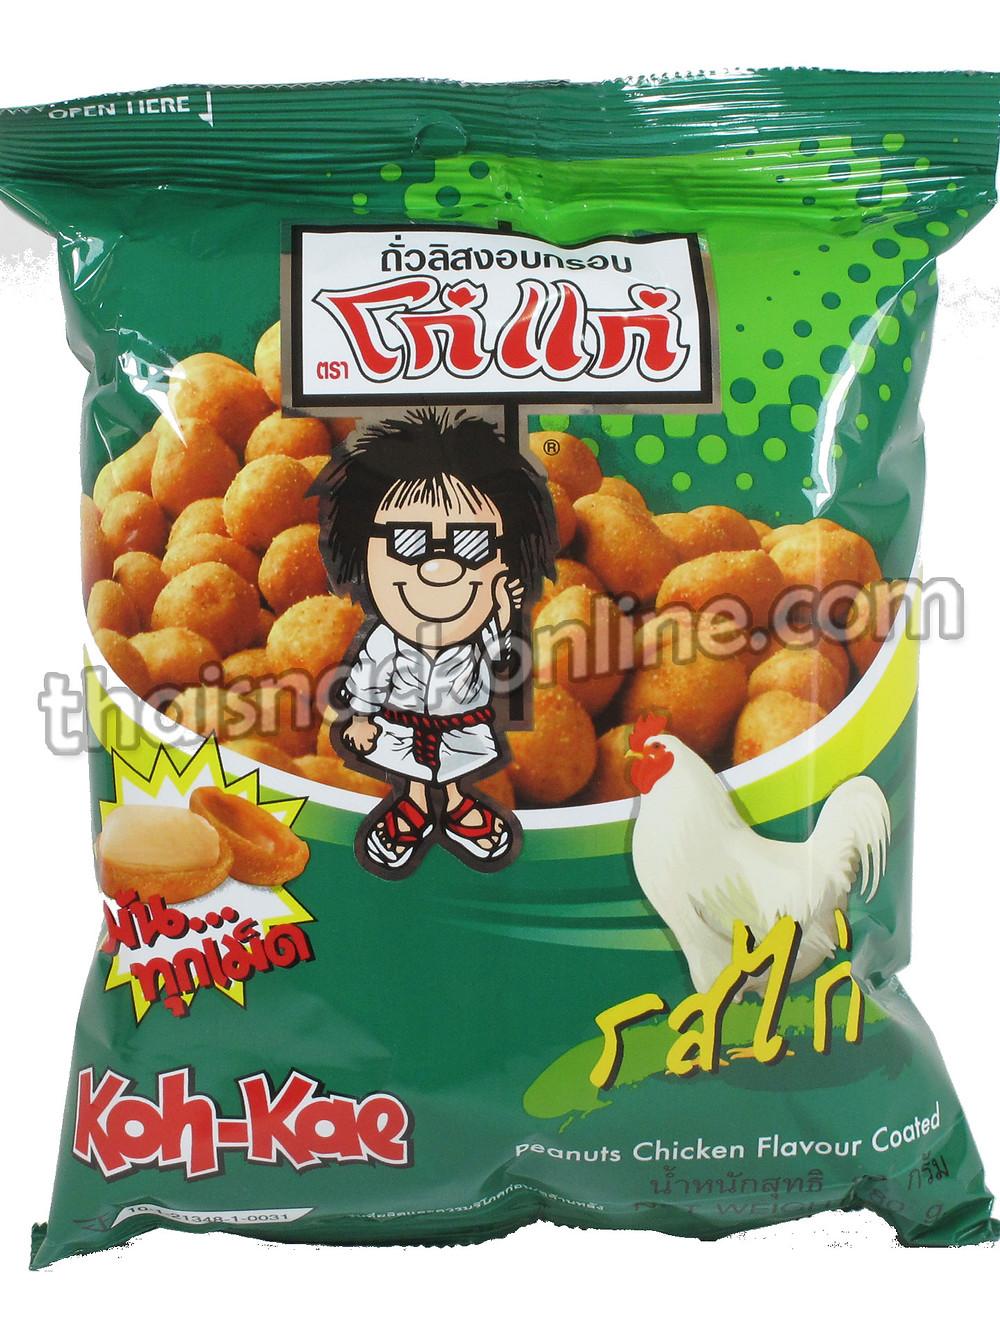 Koh Kae - Nuts Chicken